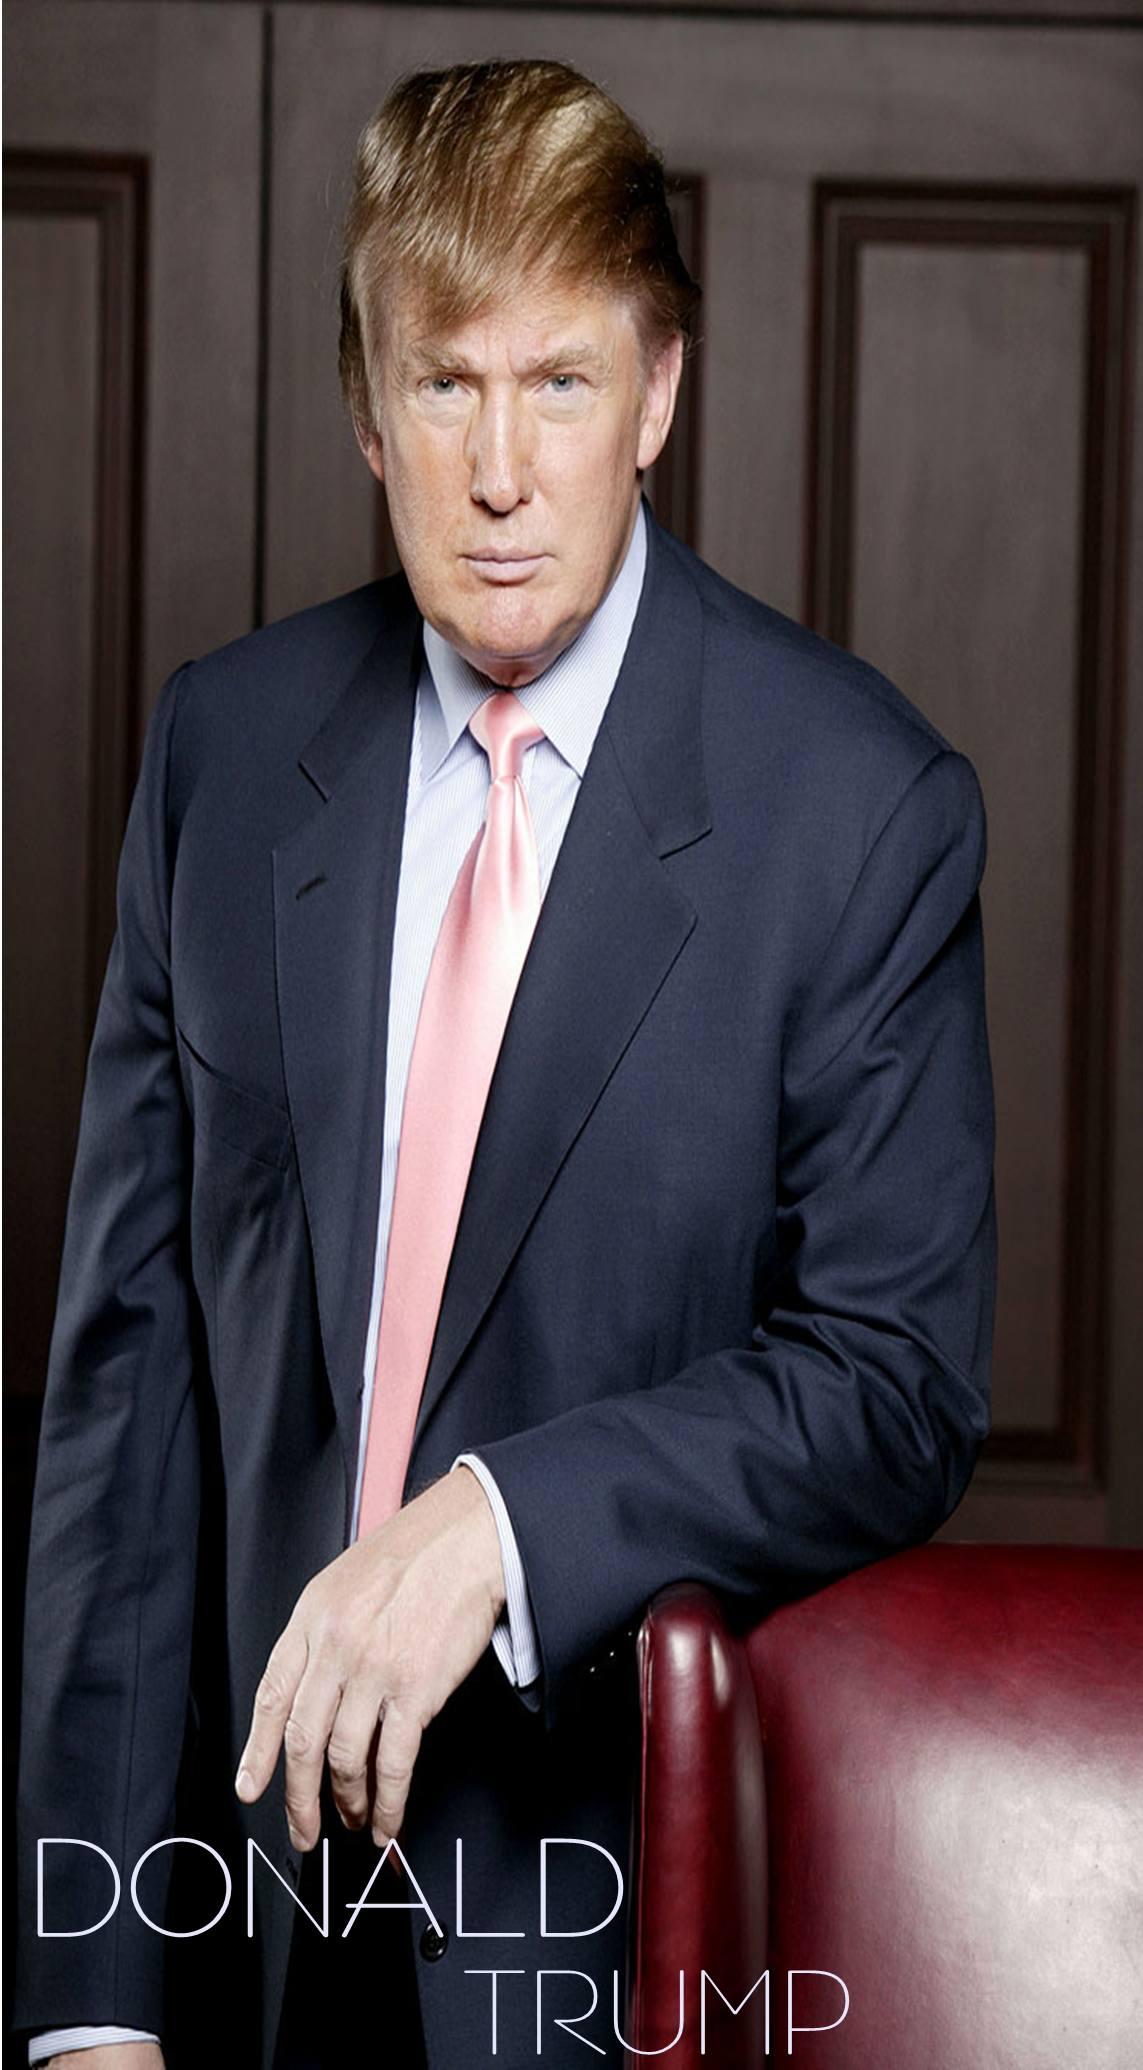 Donald Trump 2013HD WallpapersImagesPictures 1143x2070